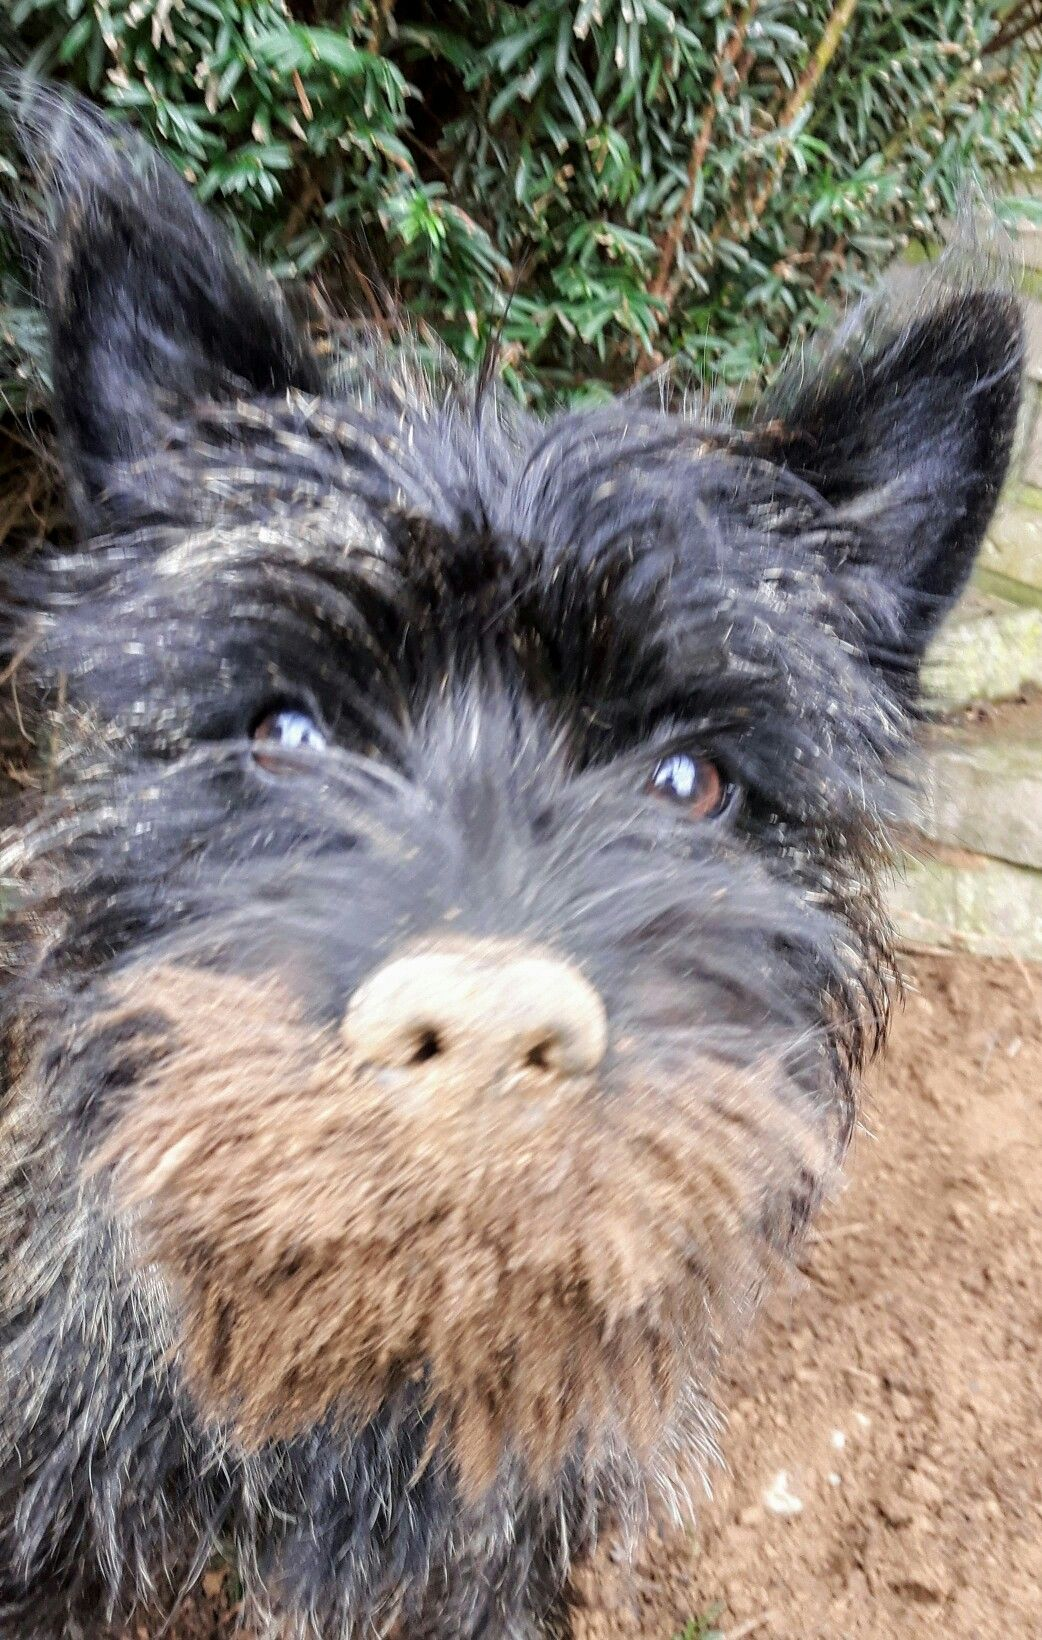 Lotta Hobby Locher Graben Cairn Terrier Terrier Animals